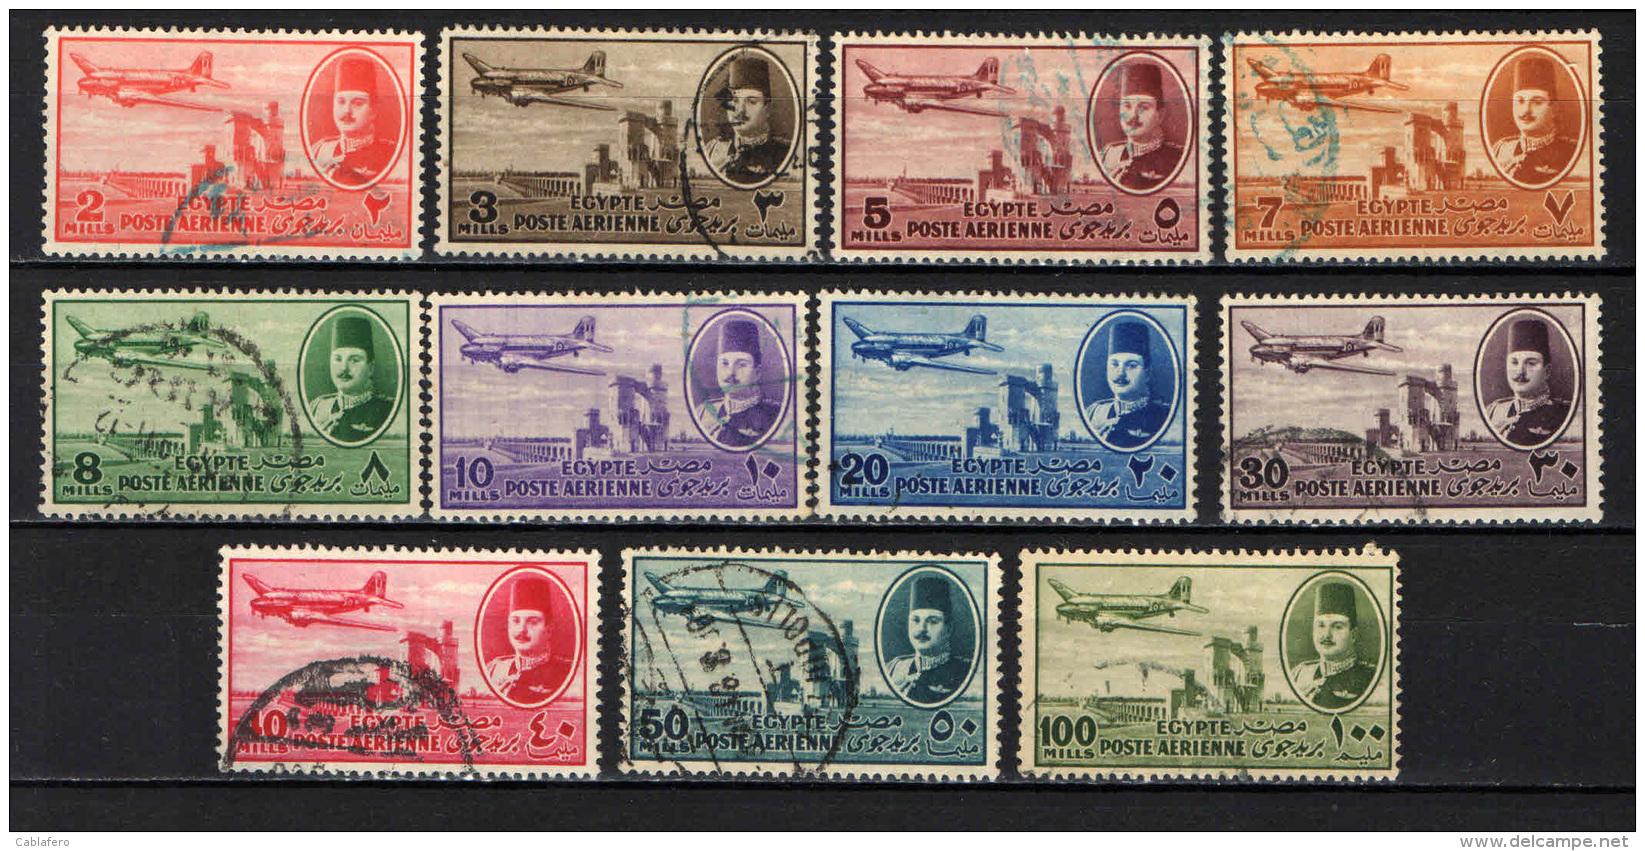 EGITTO - 1947 - AEREO ED EFFIGIE DEL RE FAROUK - USATI - Posta Aerea